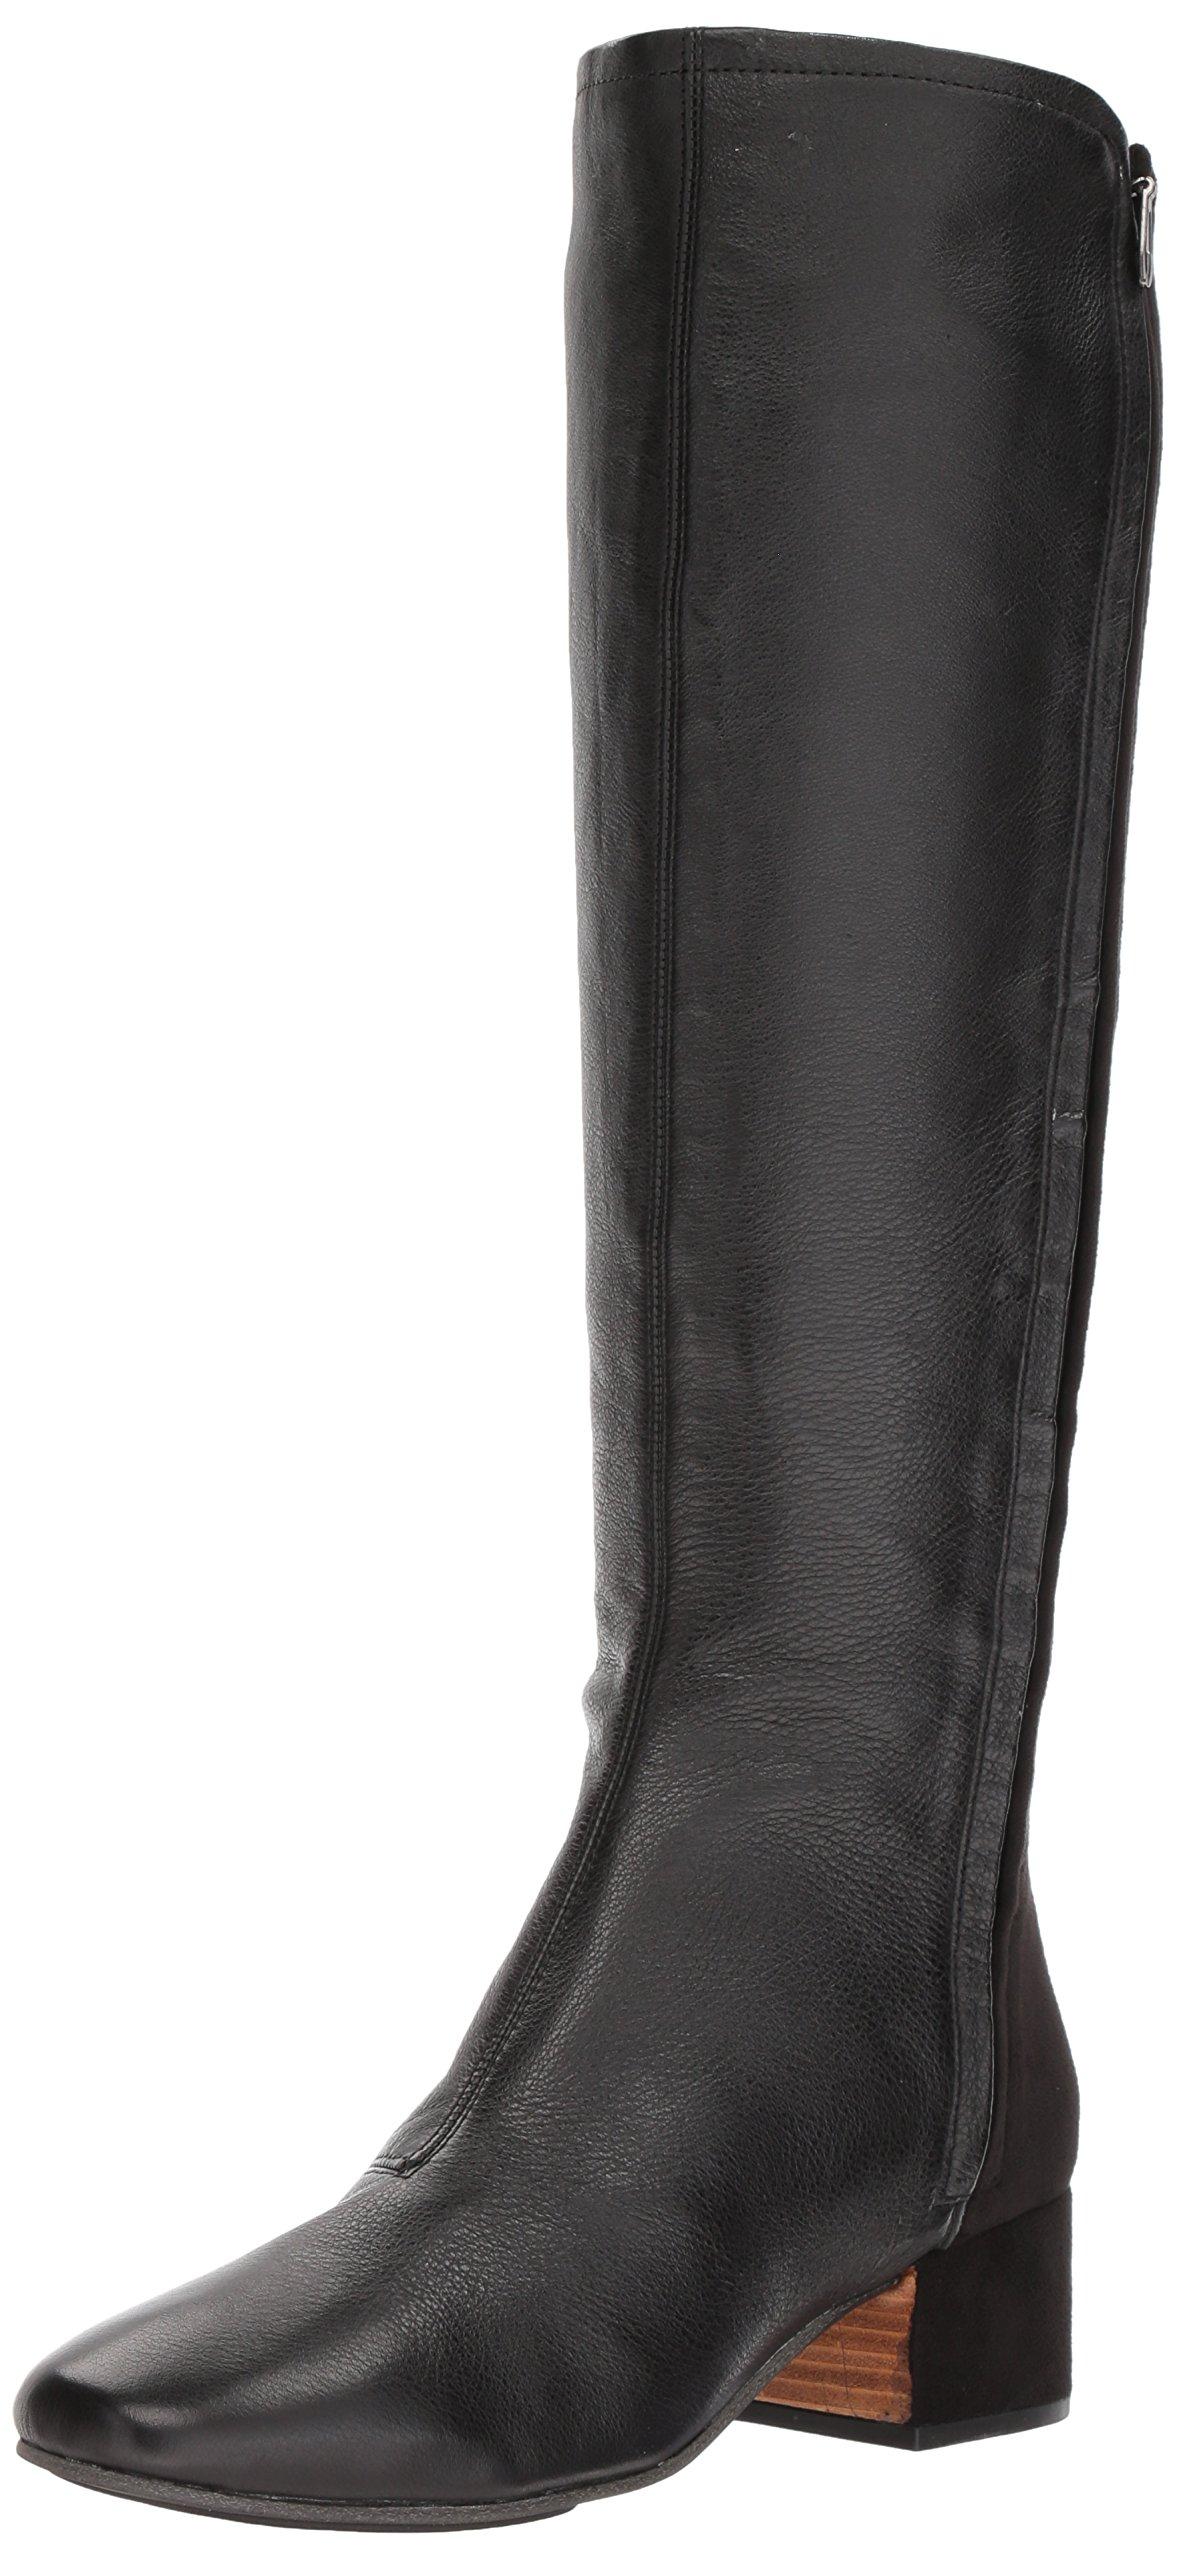 Gentle Souls Women's Ella-Seti Stretch Zippers Knee High Boot, Black Leather, 10 Medium US